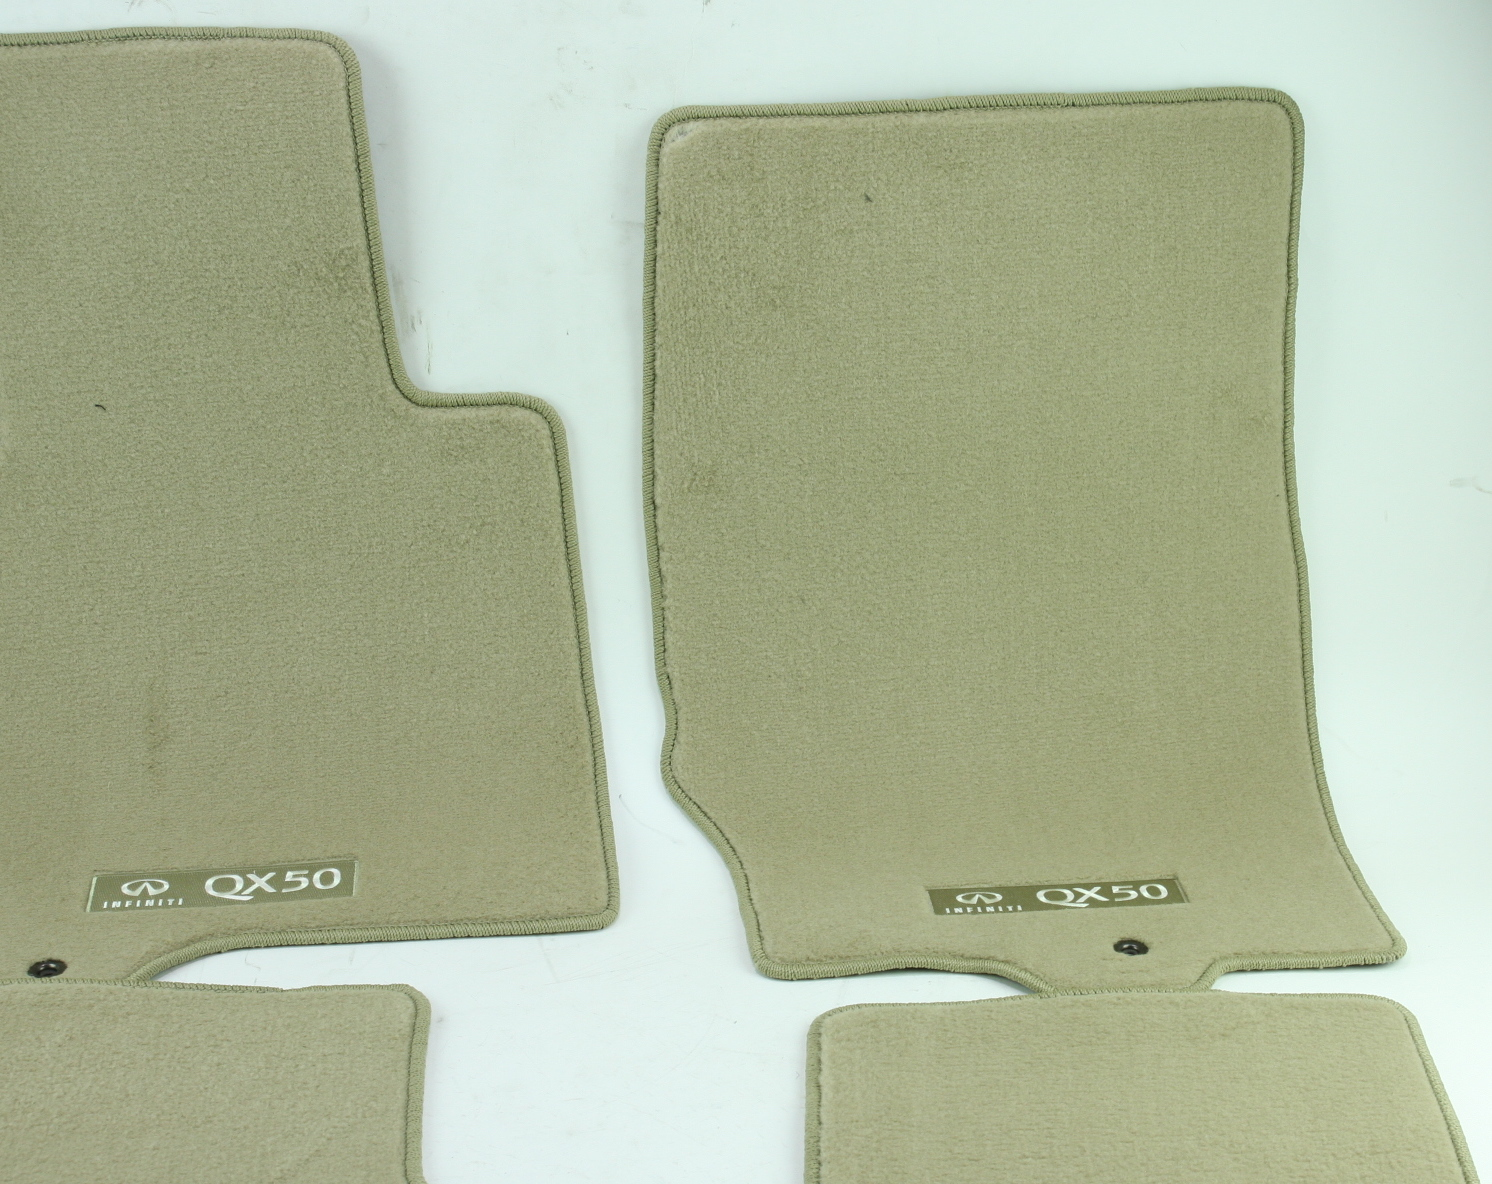 ** Genuine Infiniti Floor Mats Carpeted Wheat Nissan G4900-1UR4J New OEM - image 5